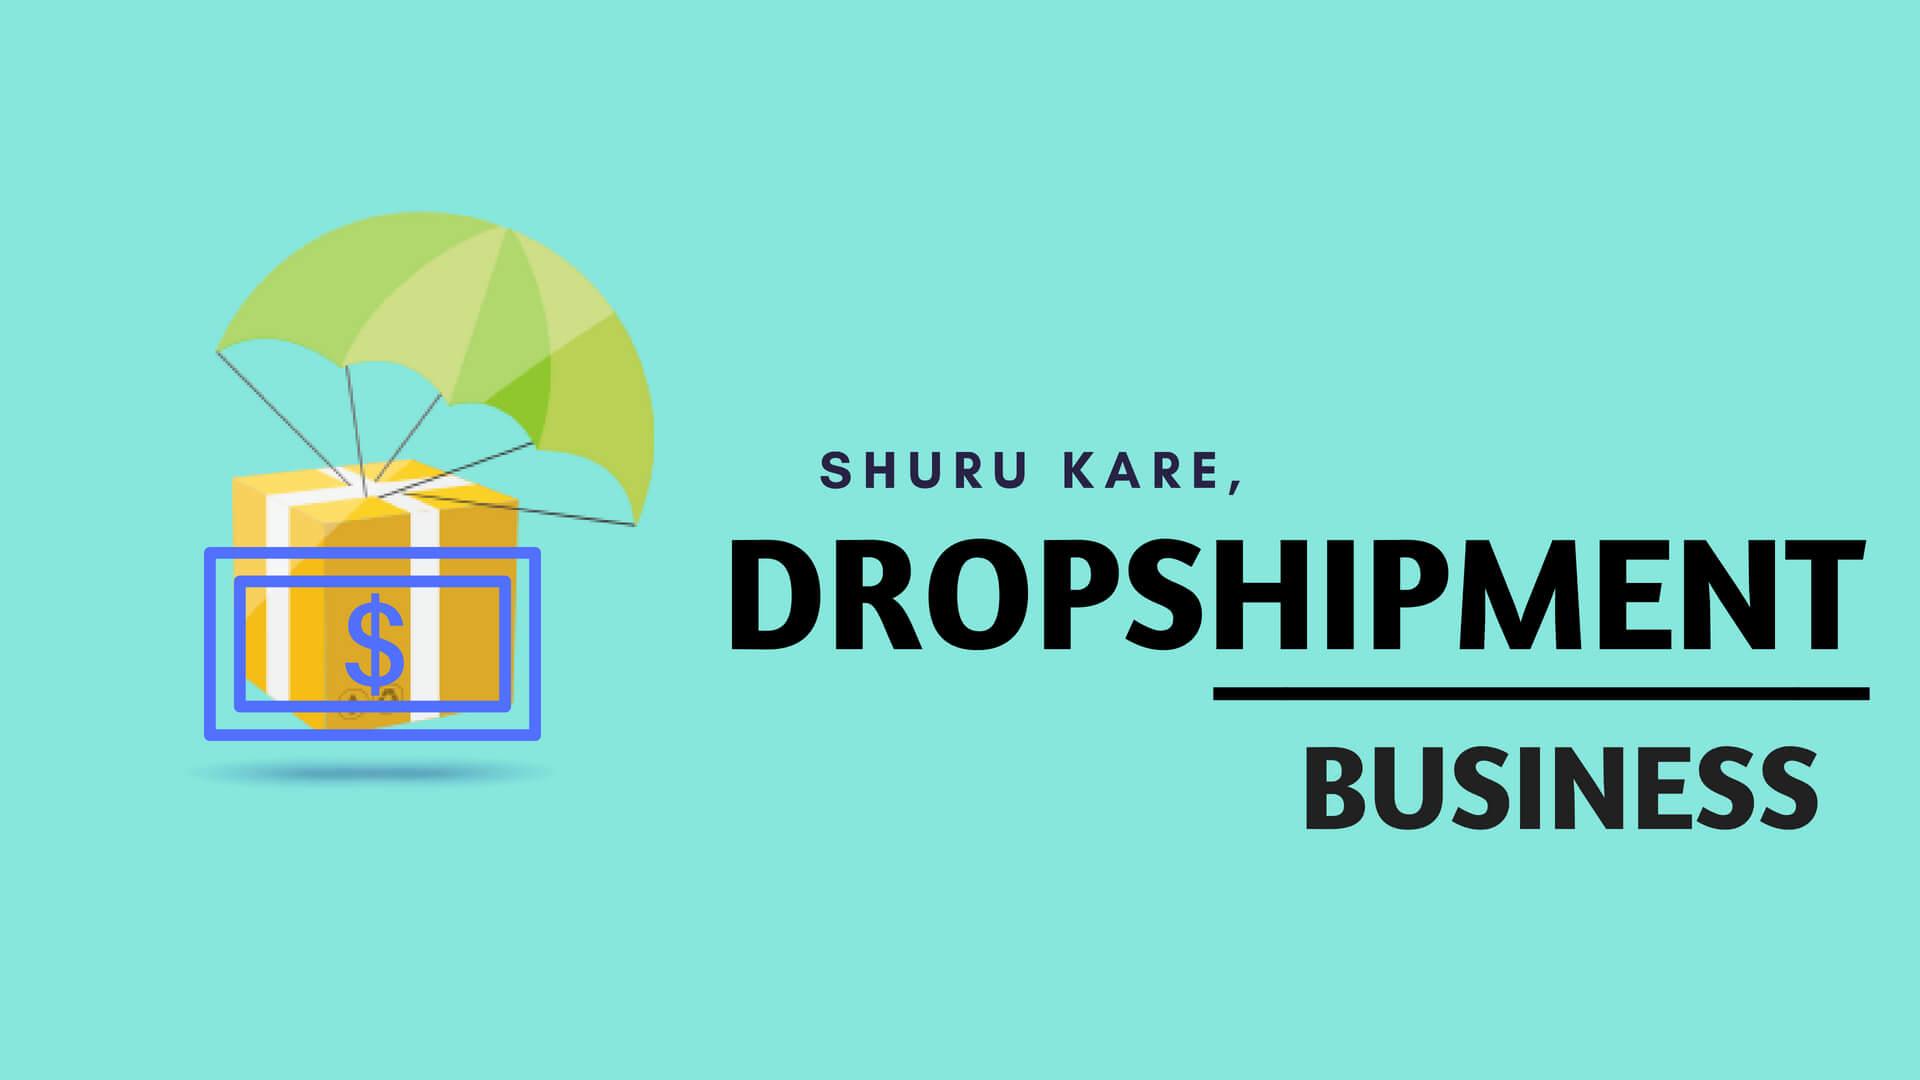 Online Drop shipment Business Kya Hai? इससे पैसा कैसे कमाए?